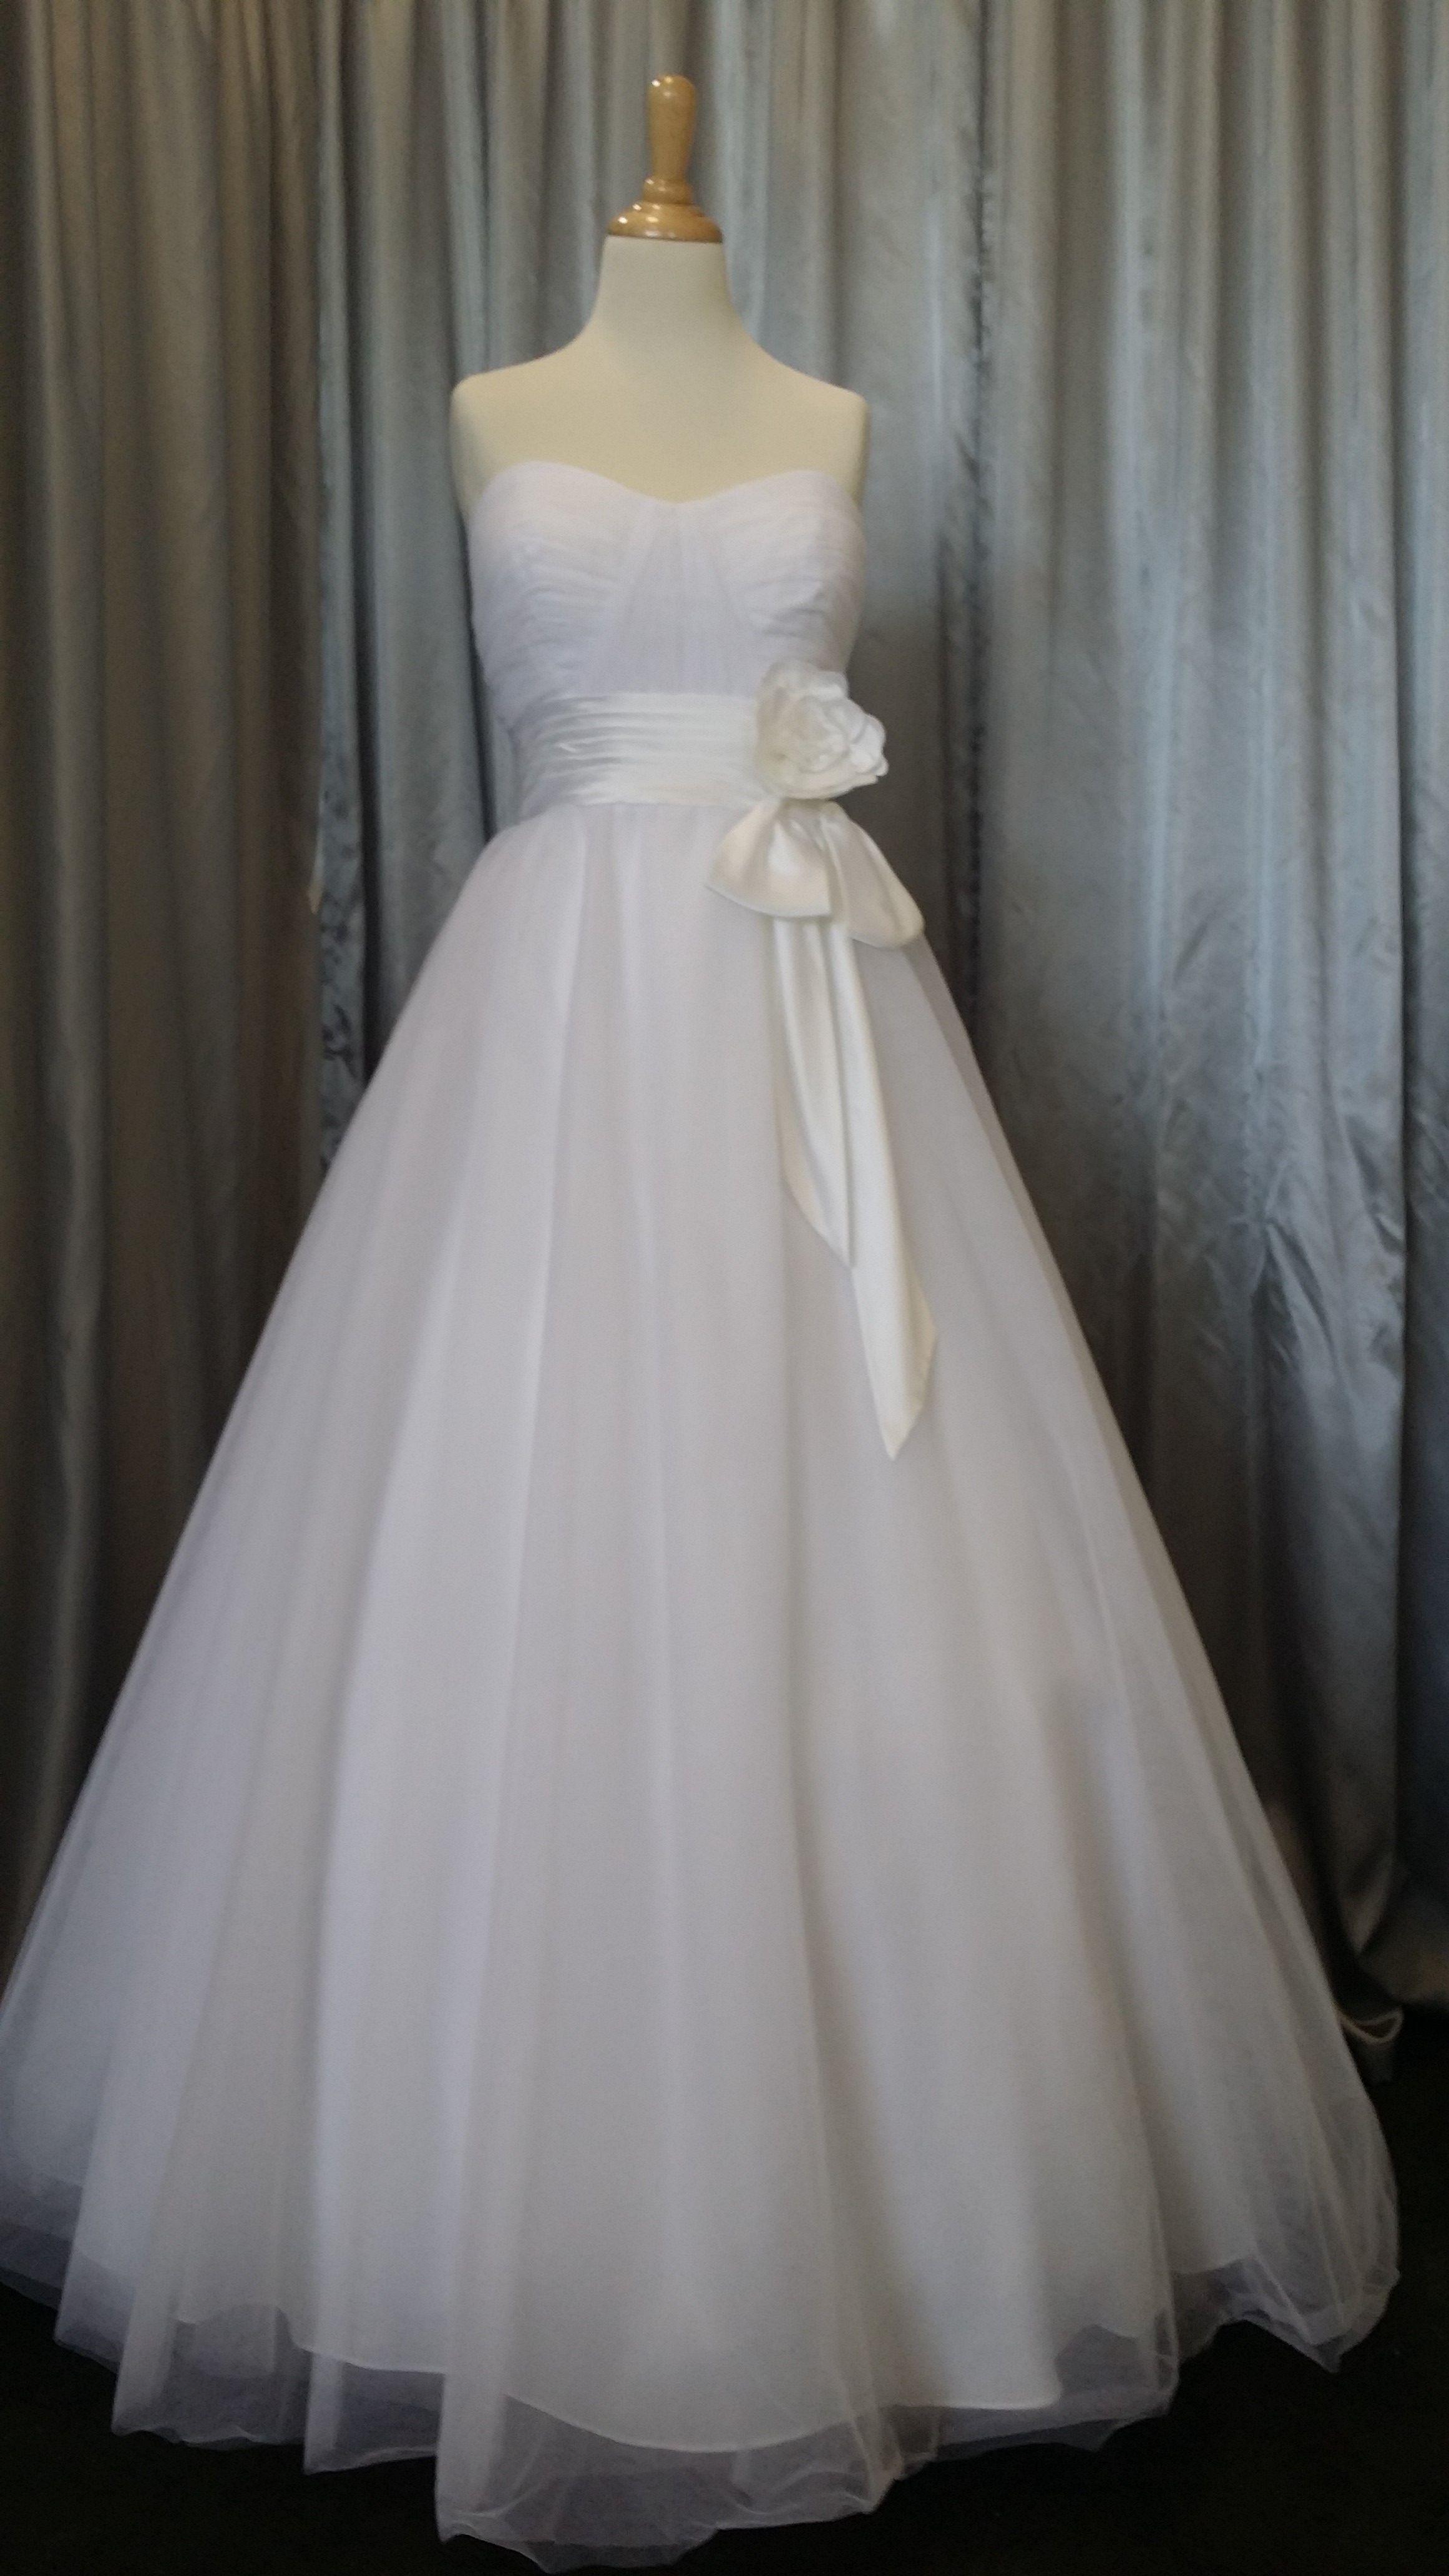 Debutante Gown www.vintagetulle.com.au | Vintage Tulle | Pinterest ...